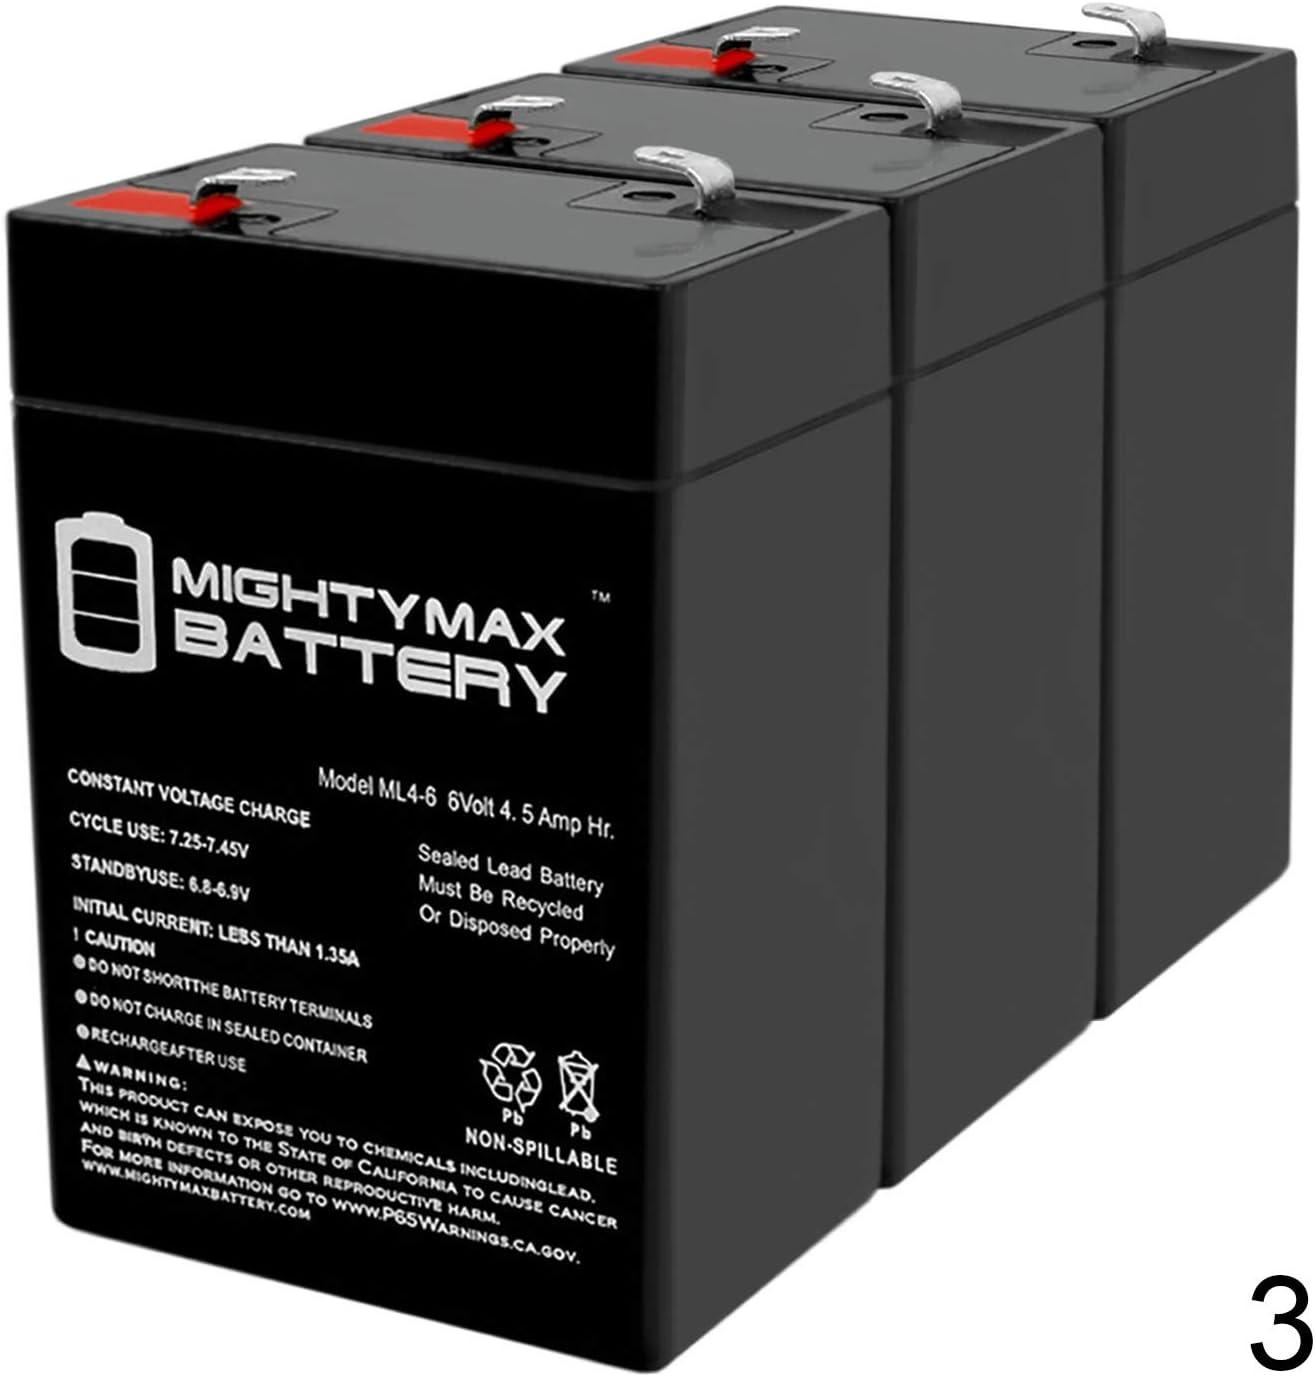 ml4 – 6 – 6 V 4.5 AH一般00648 Sealed non-spillable緊急ライトバッテリーwka6 – 5 F – 3パック – Mighty Maxバッテリーブランド製品